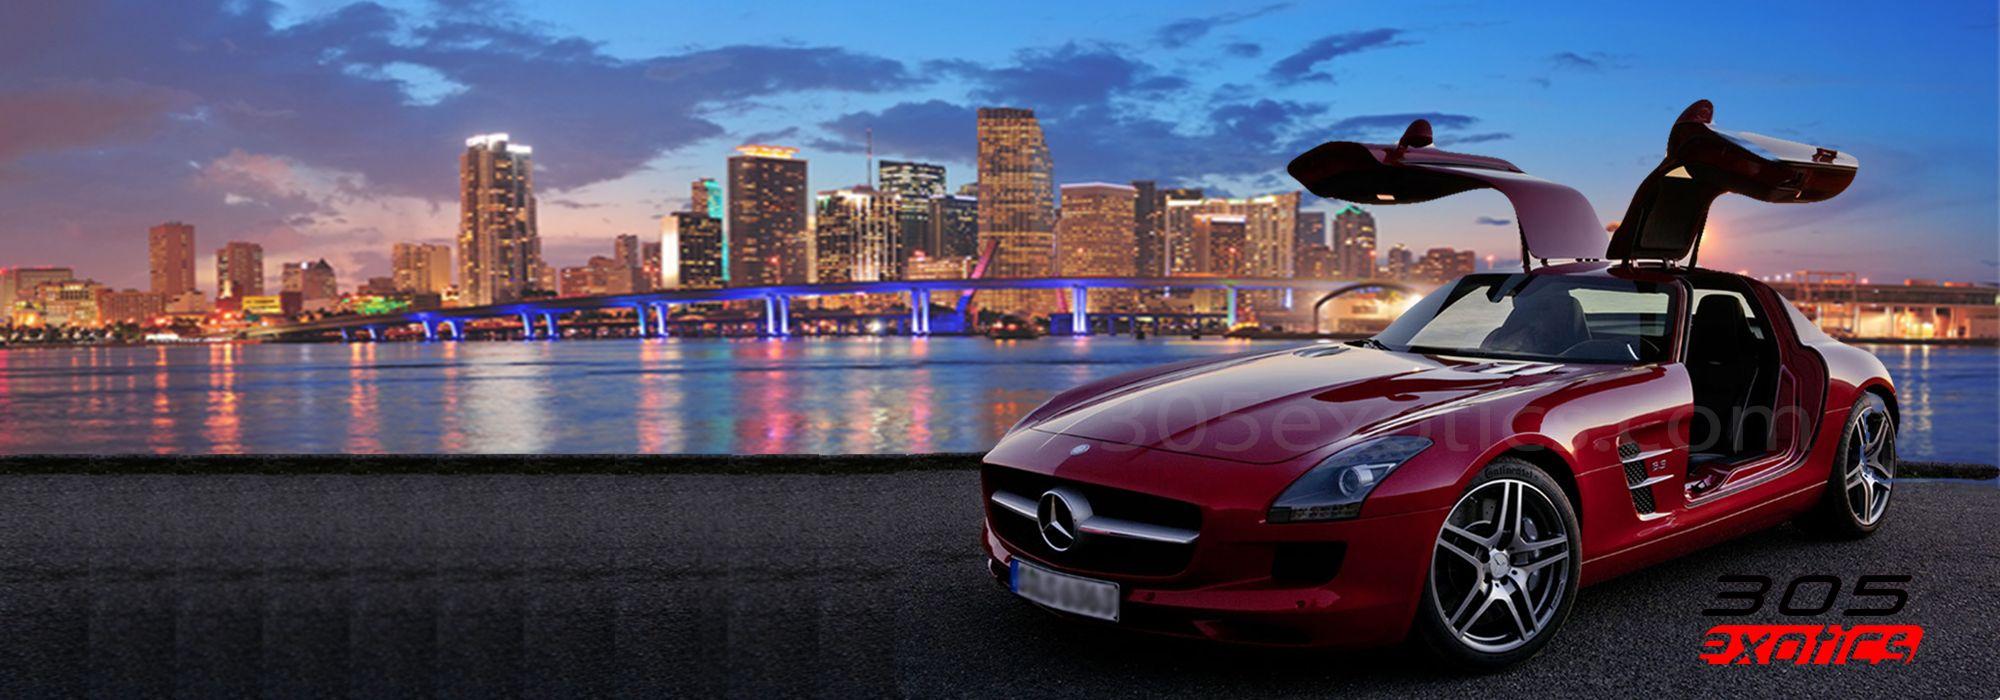 Exotic Car Rental Miami Beach Ft Lauderdale West Palm Beach